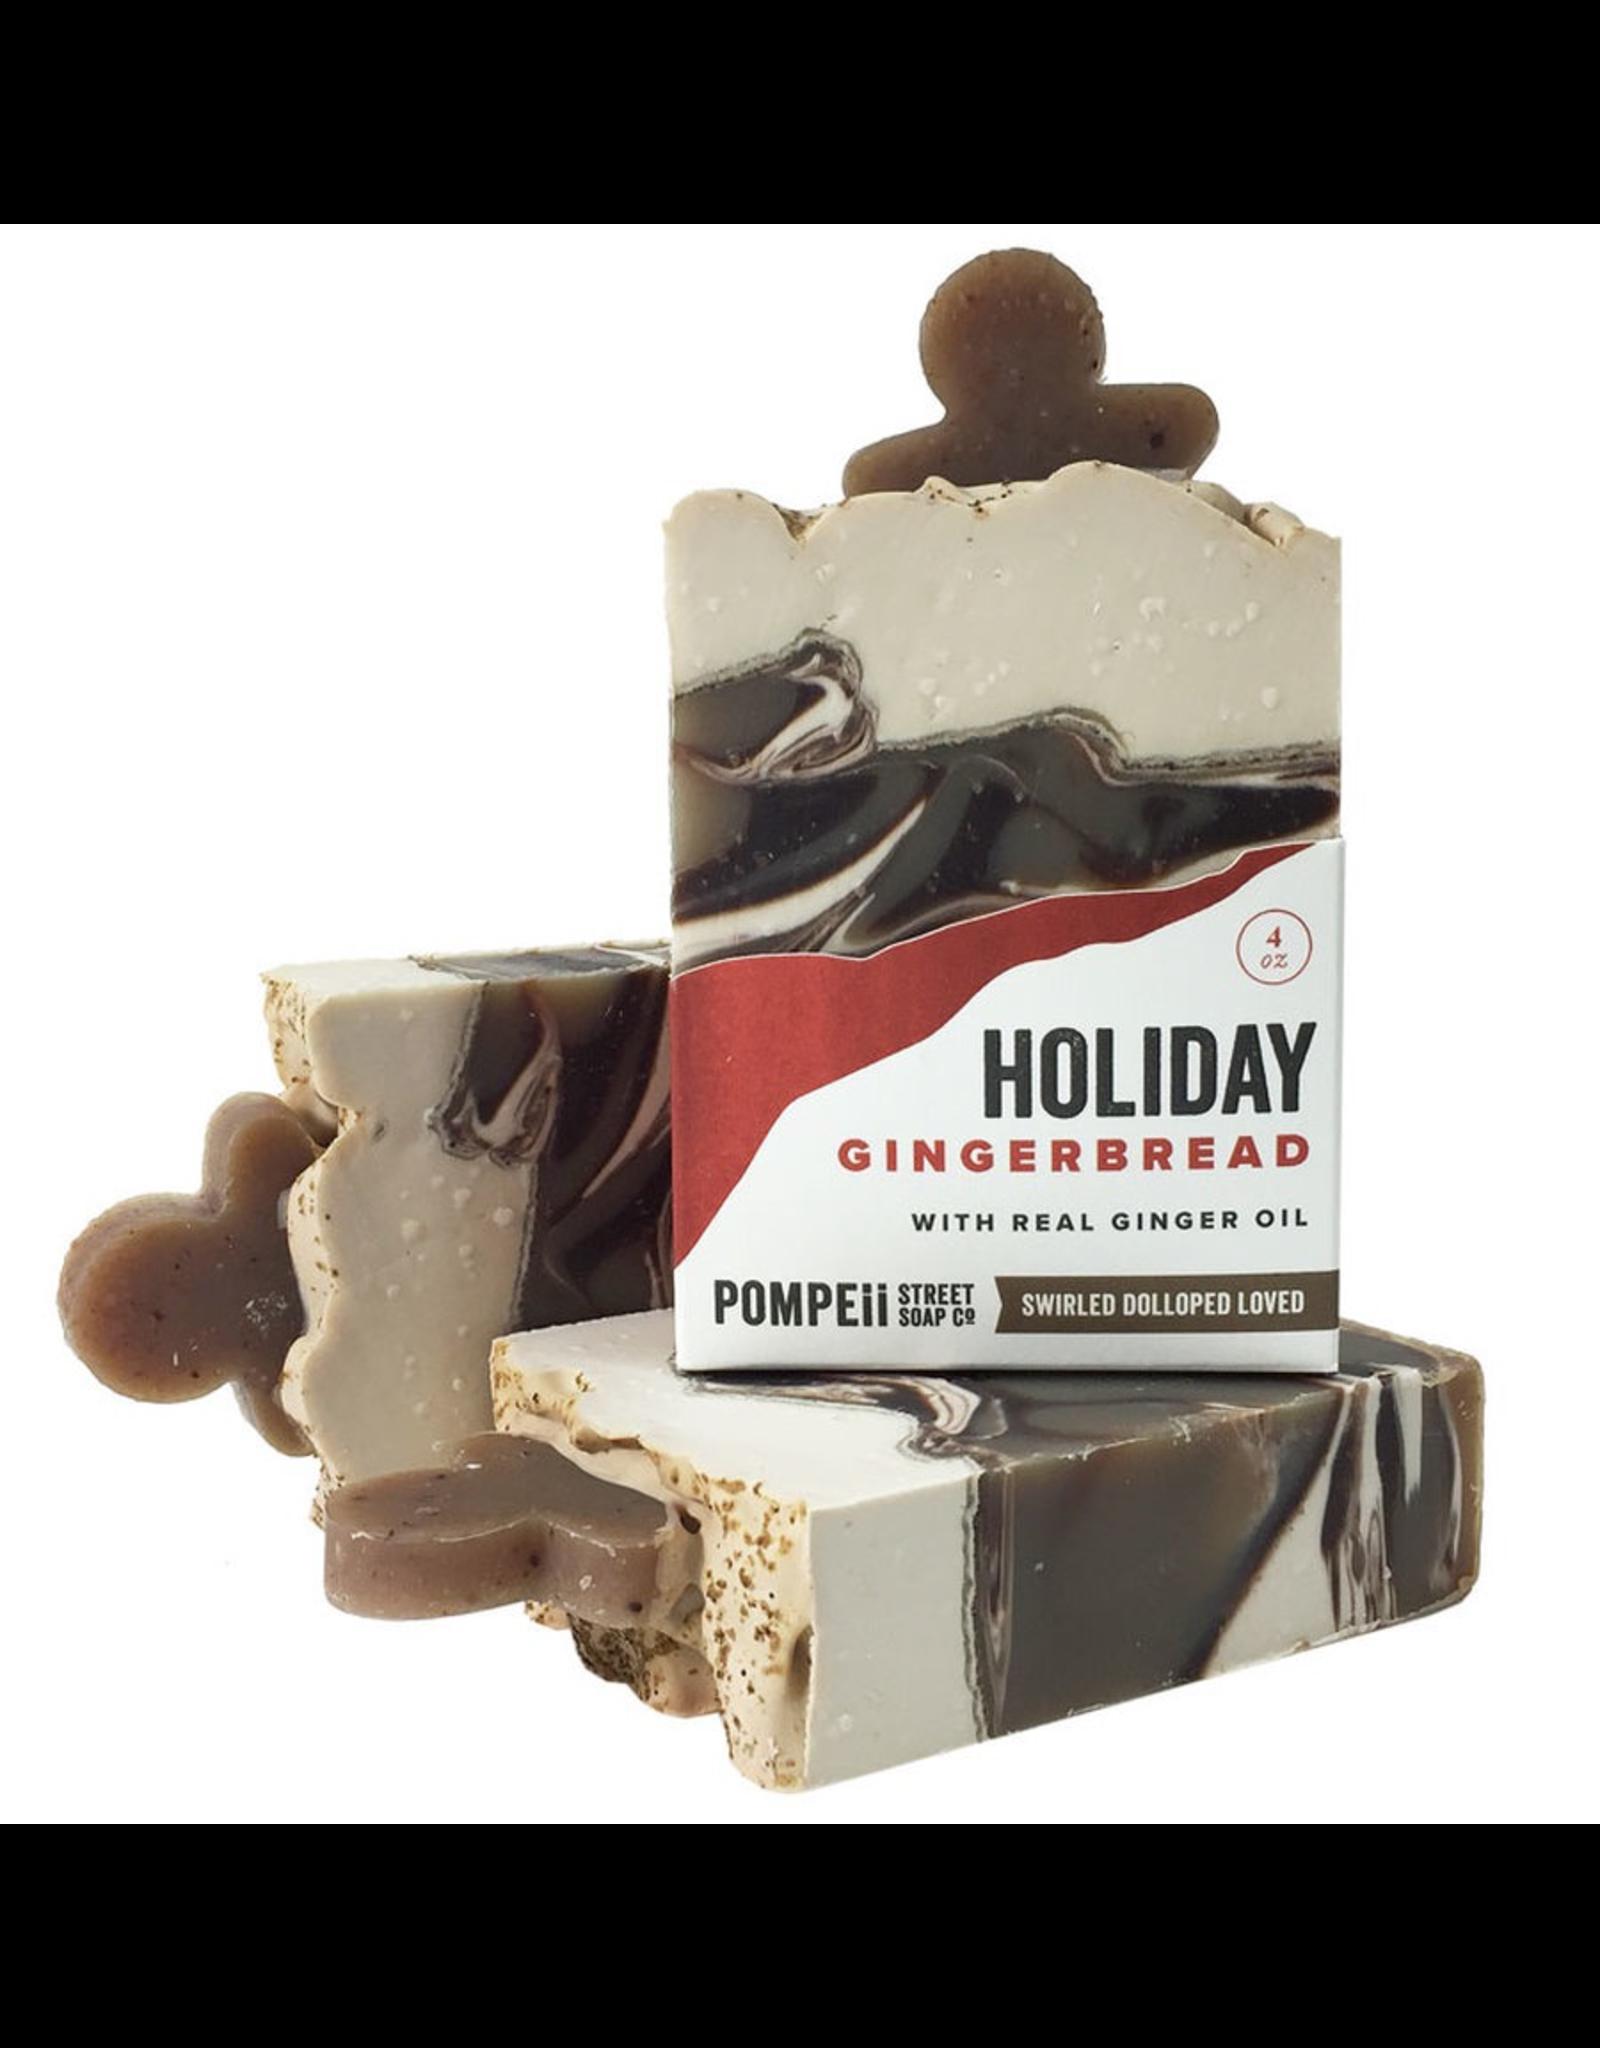 Pompeii Gingerbread Soap 4 oz.